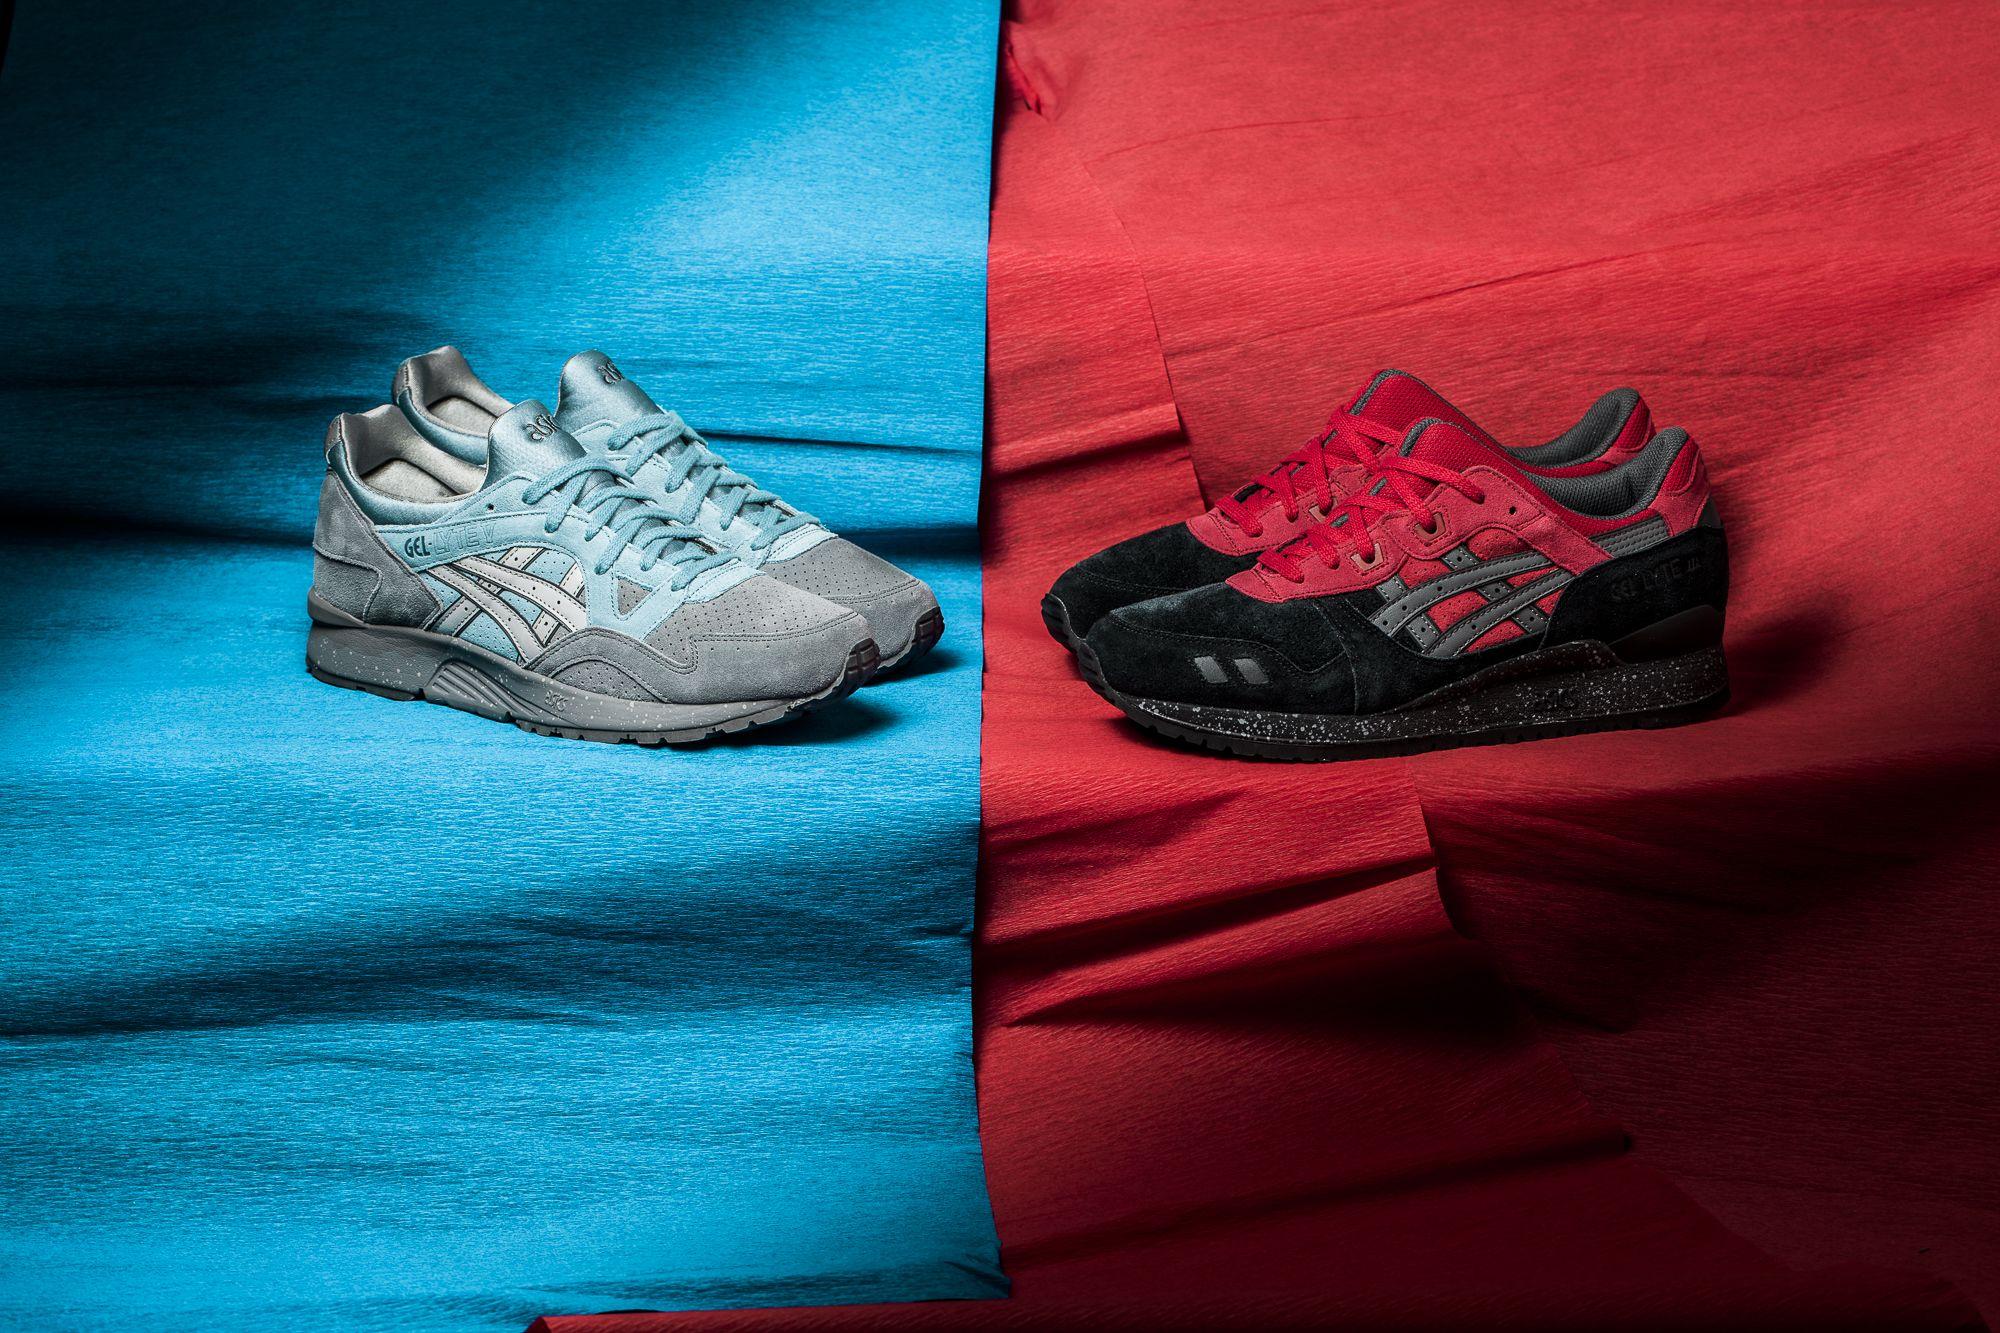 Asics Gel-Lyte V in Three Pastel Colorways for June 2017 - EU Kicks:  Sneaker Magazine | Street Sneakers | Pinterest | Asics and Pastels